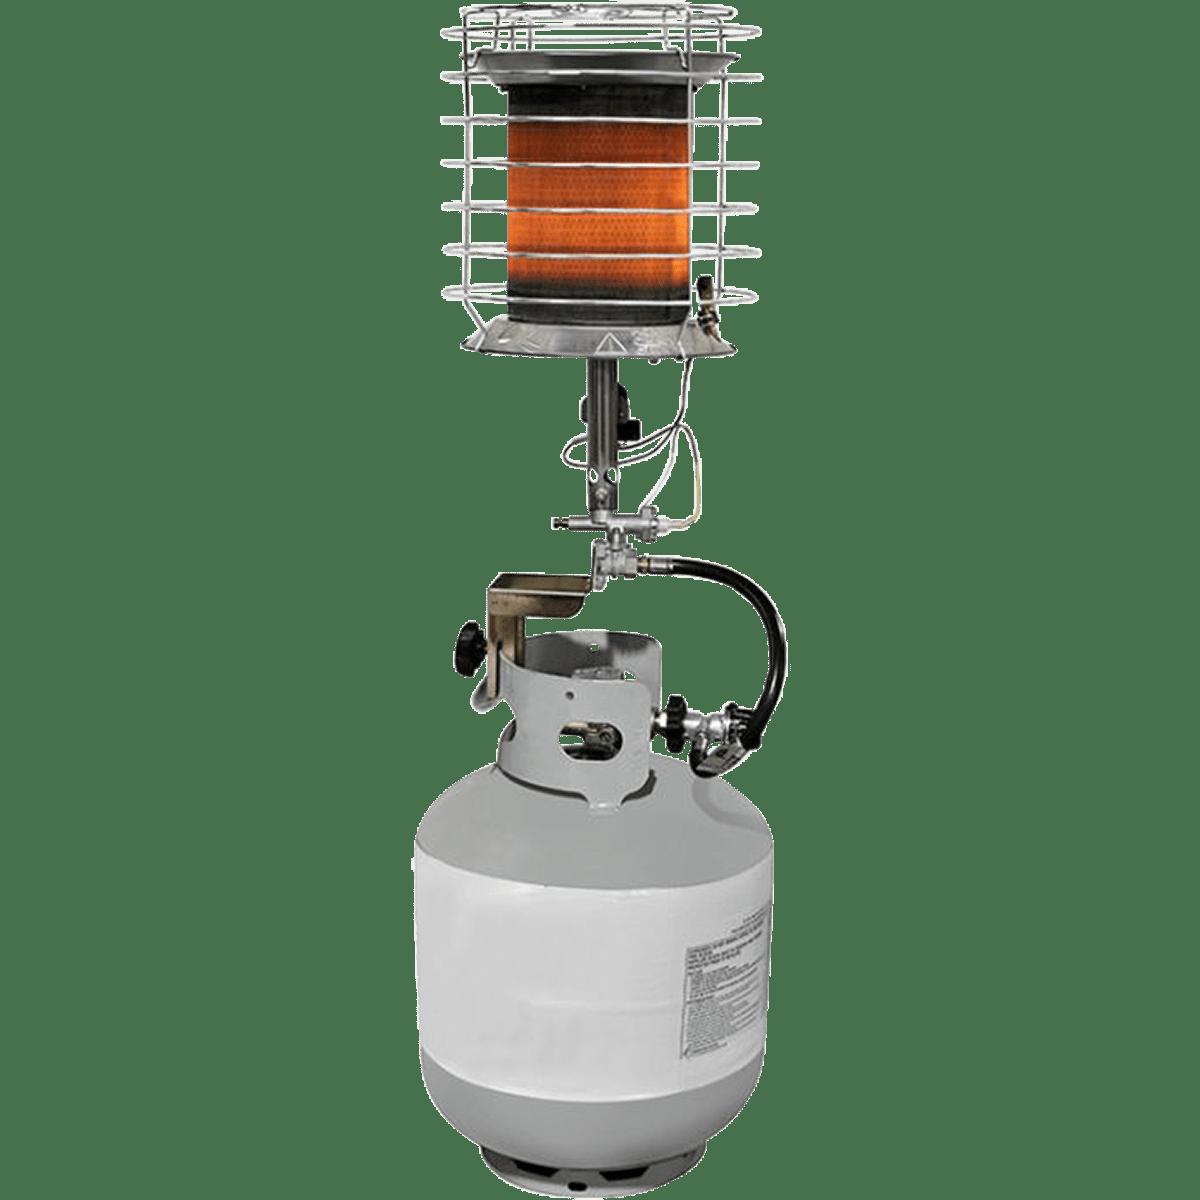 Dyna Glo Thermoheat 40 000 Btu Lp Tank Top Heater